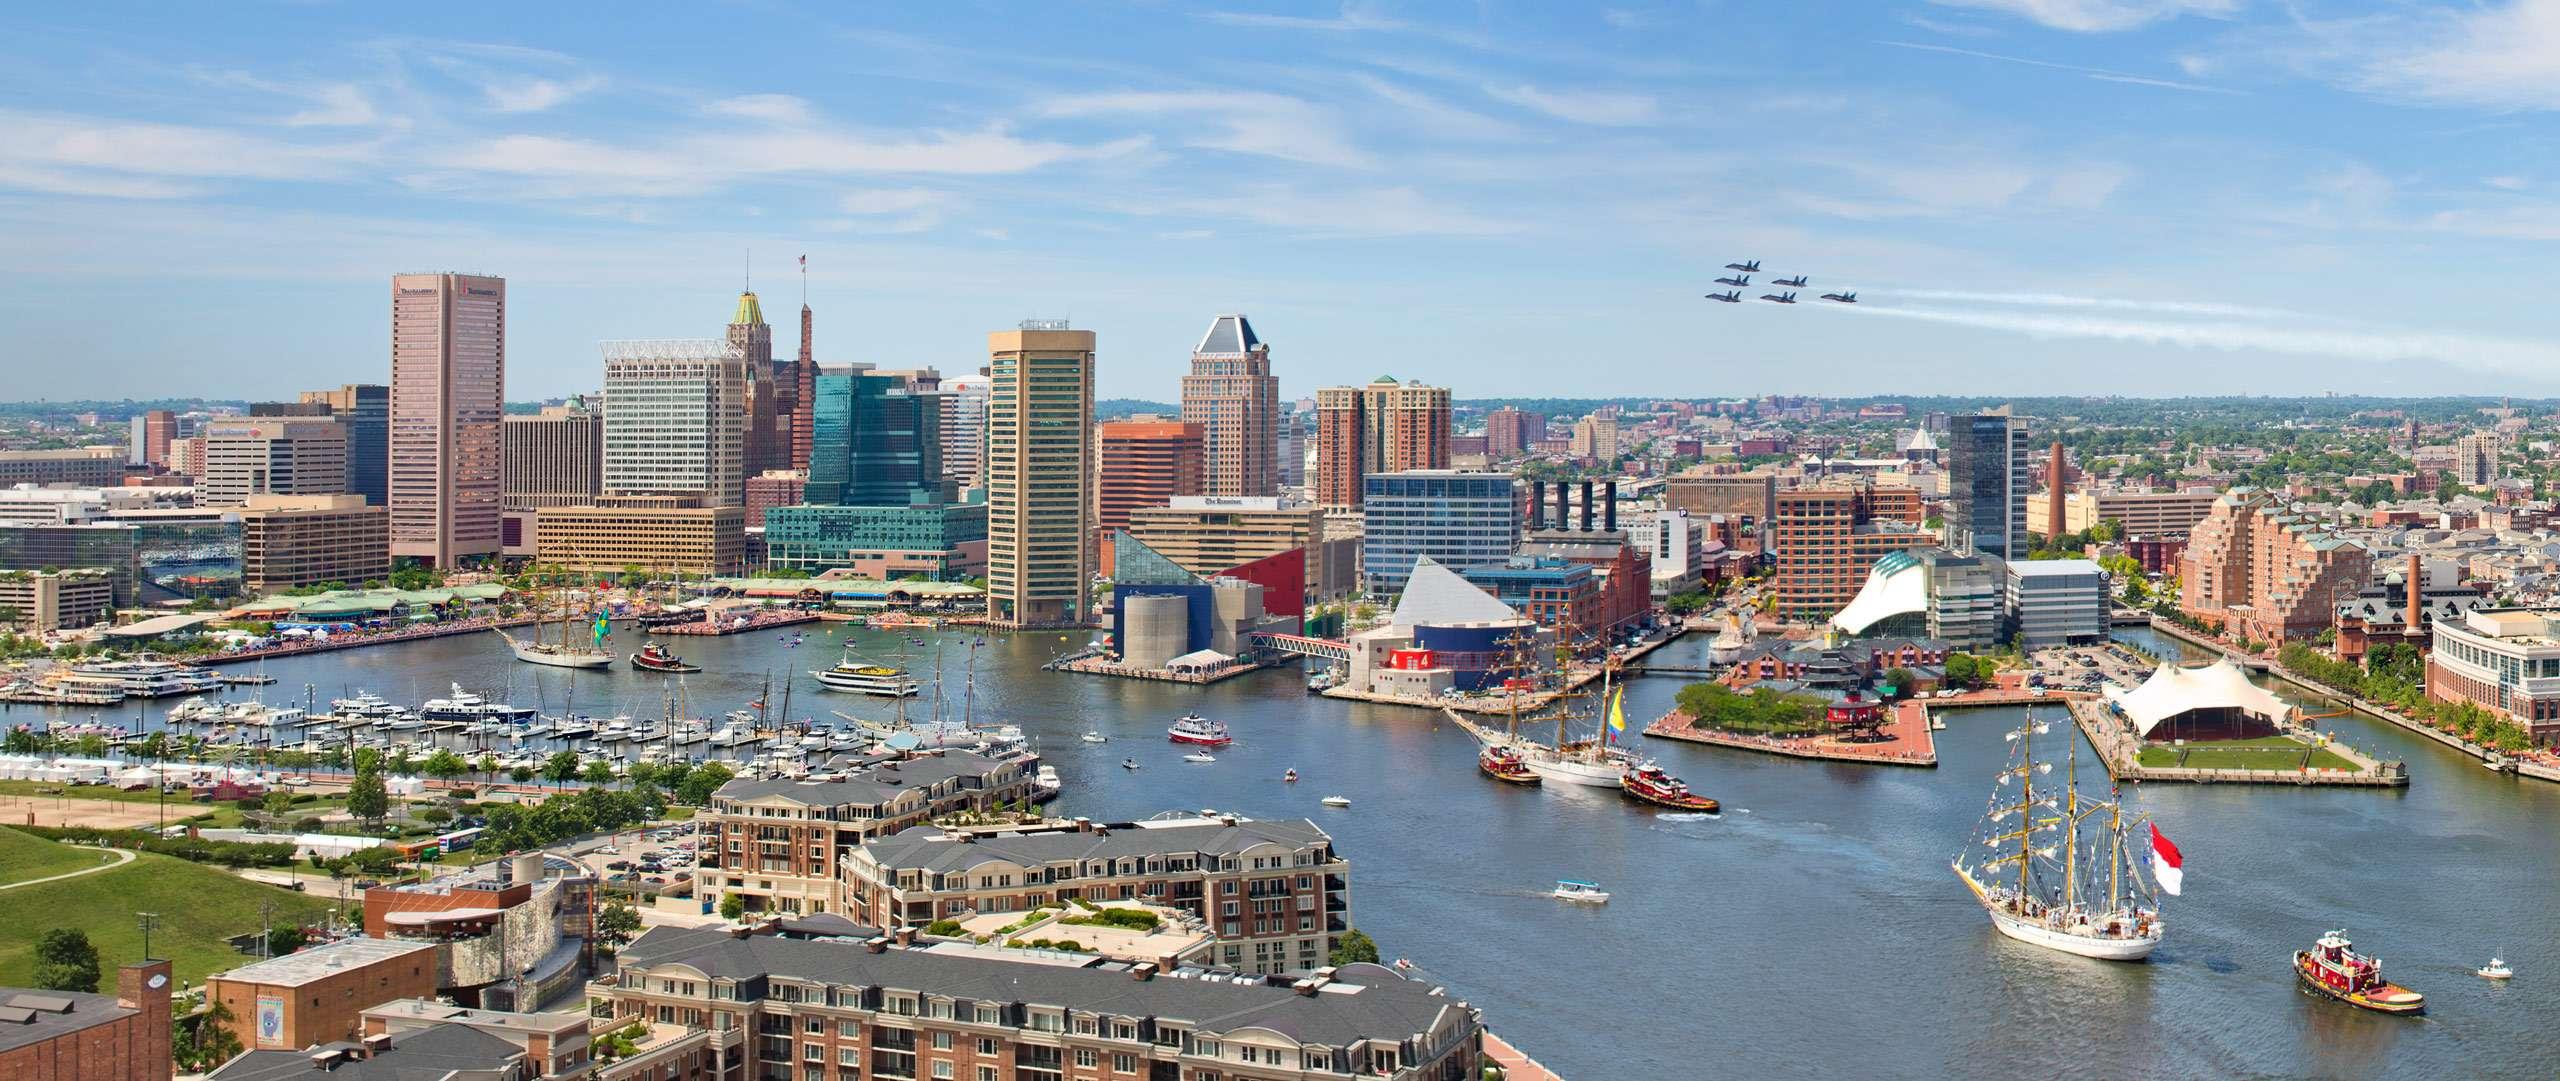 PORTFOLIO - Baltimore - Attractions  #9 PCG674